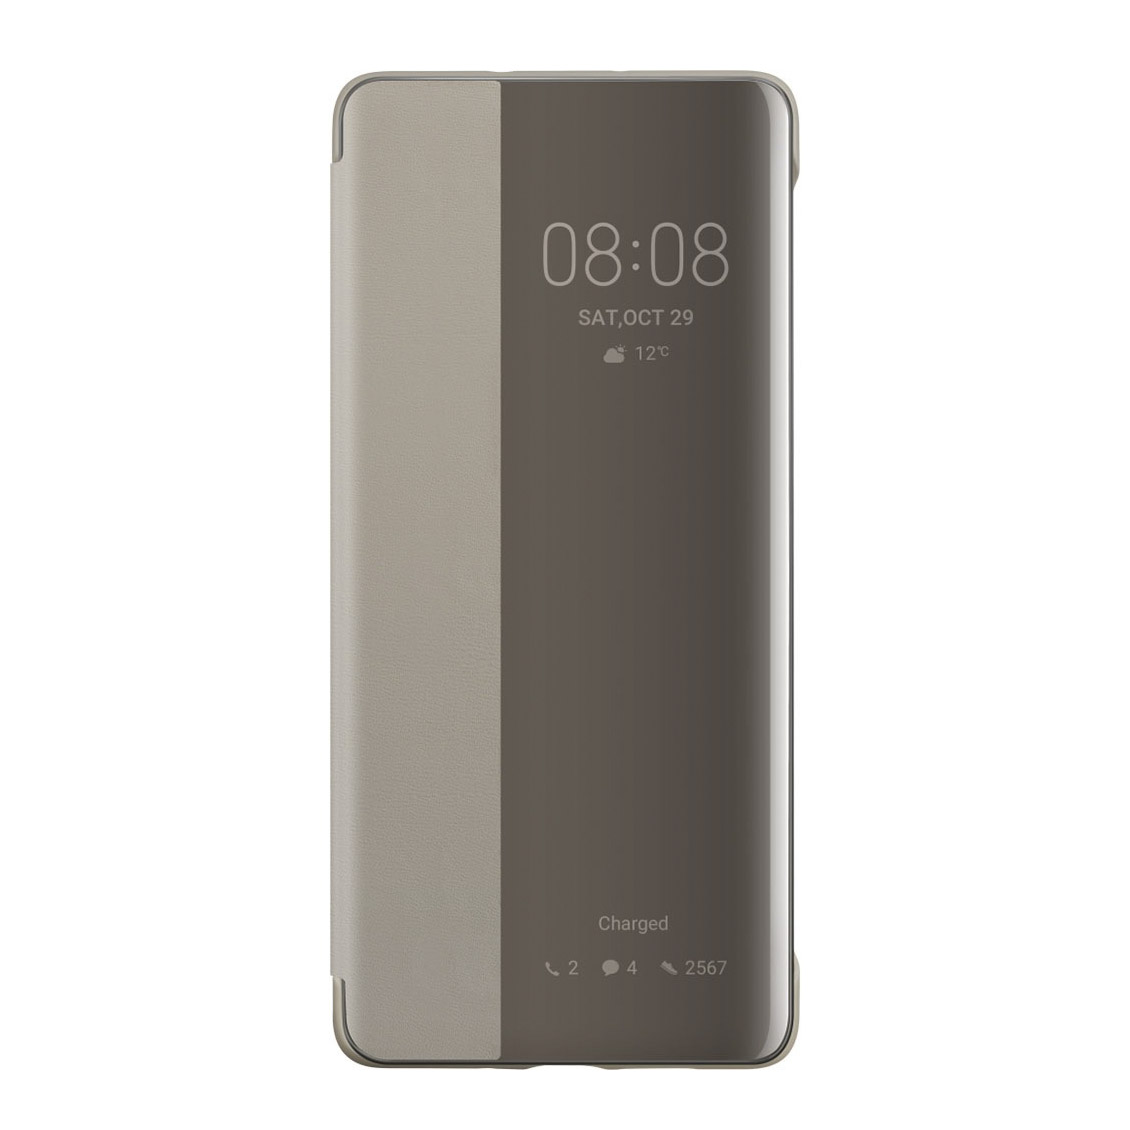 чехол honor smart view flip cover для 20 pro blue 51993394 Чехол для смартфона Huawei P30 Pro Smart View Flip Cover, хаки